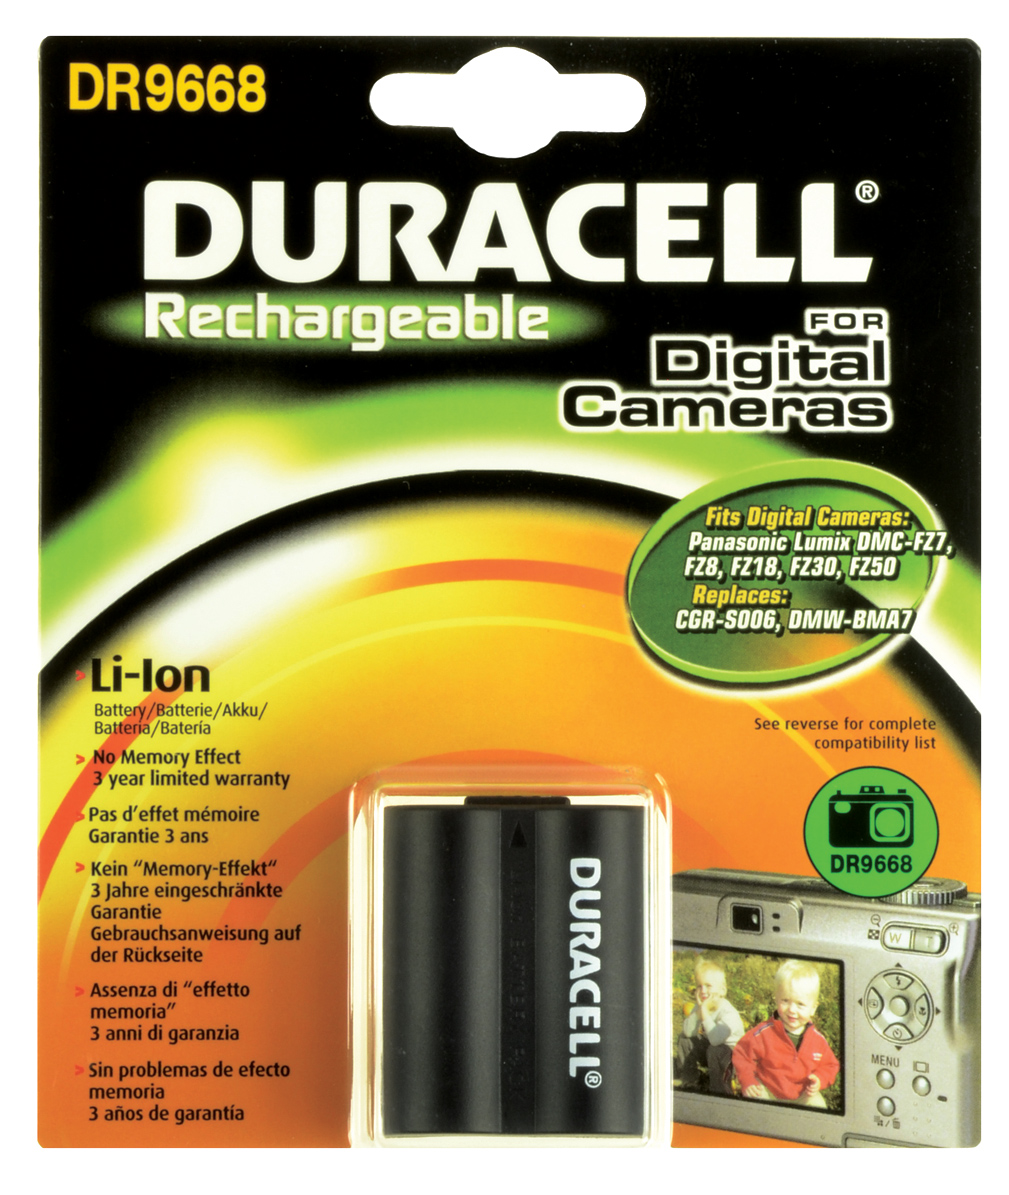 Baterie do fotoaparátu Panasonic Lumix DMC-FZ7EE-K/DMC-FZ7EE-S/DMC-FZ7EF-K/DMC-FZ7EF-S/DMC-FZ7EG-K/DMC-FZ7EG-S/DMC-FZ7GK/DMC-FZ7K/DMC-FZ7S/DMC-FZ8,…